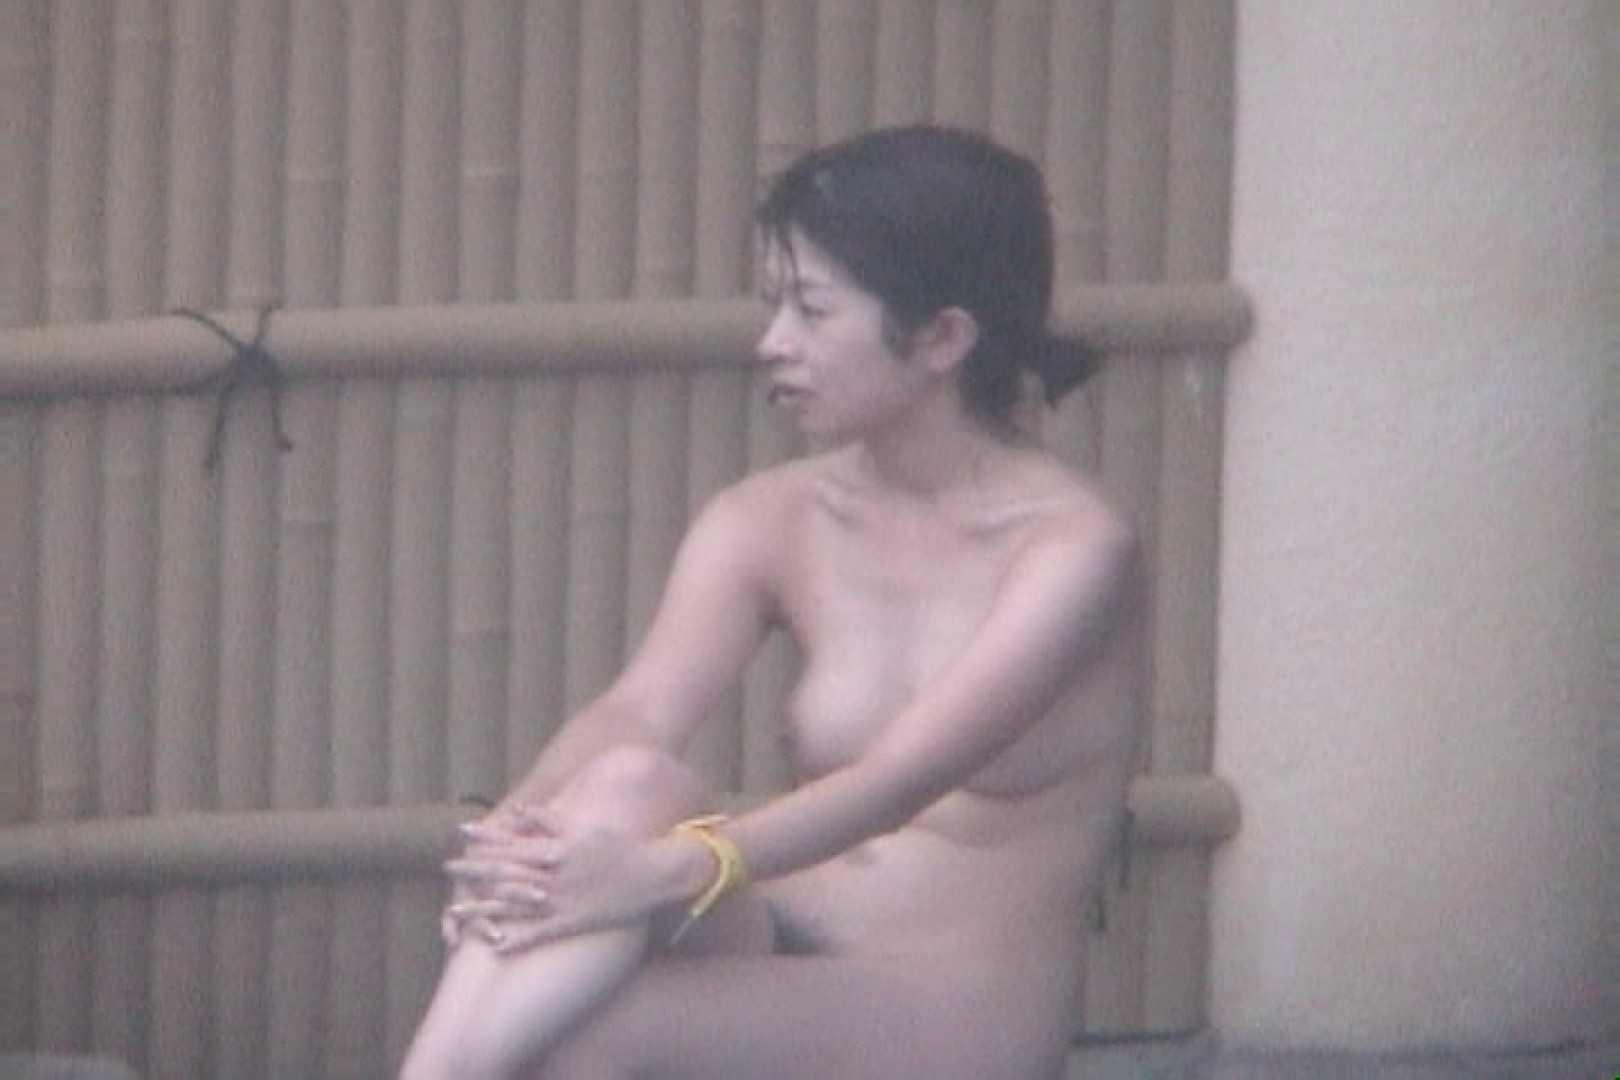 Aquaな露天風呂Vol.82【VIP限定】 盗撮 セックス画像 51連発 23